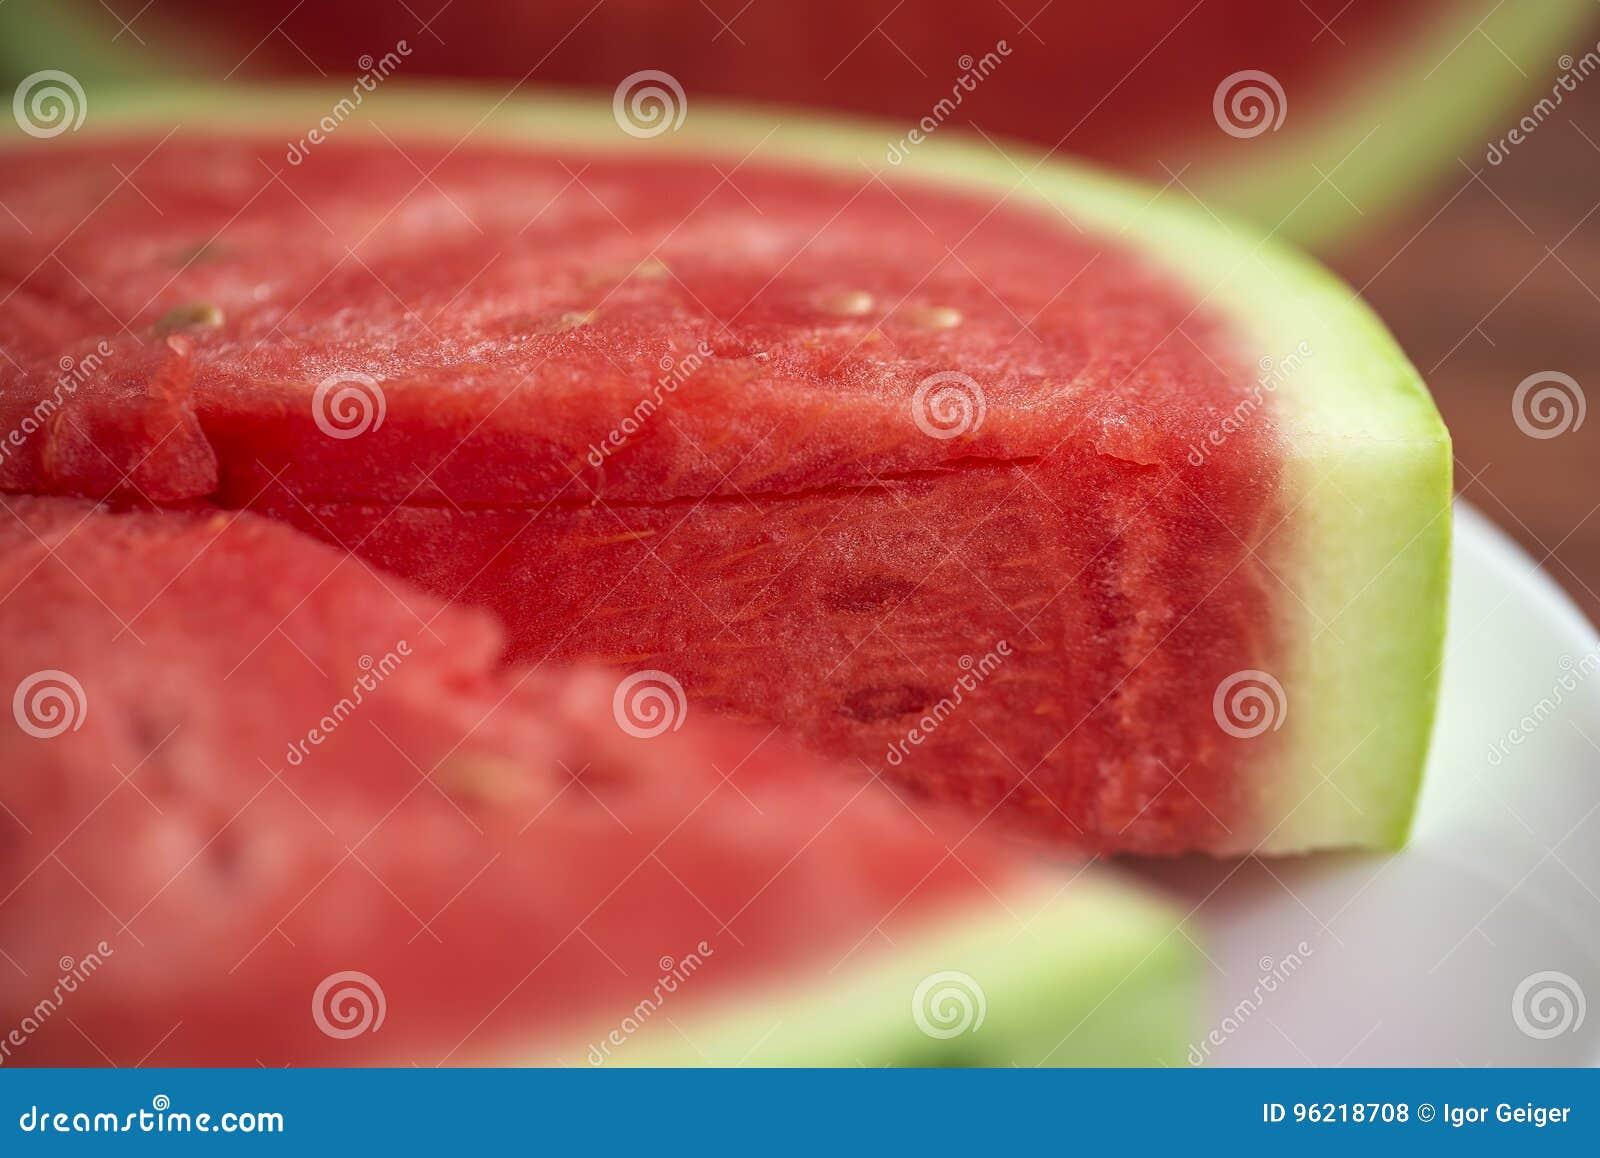 Lato owoc wciąż życie, naturalna arbuz świeżość